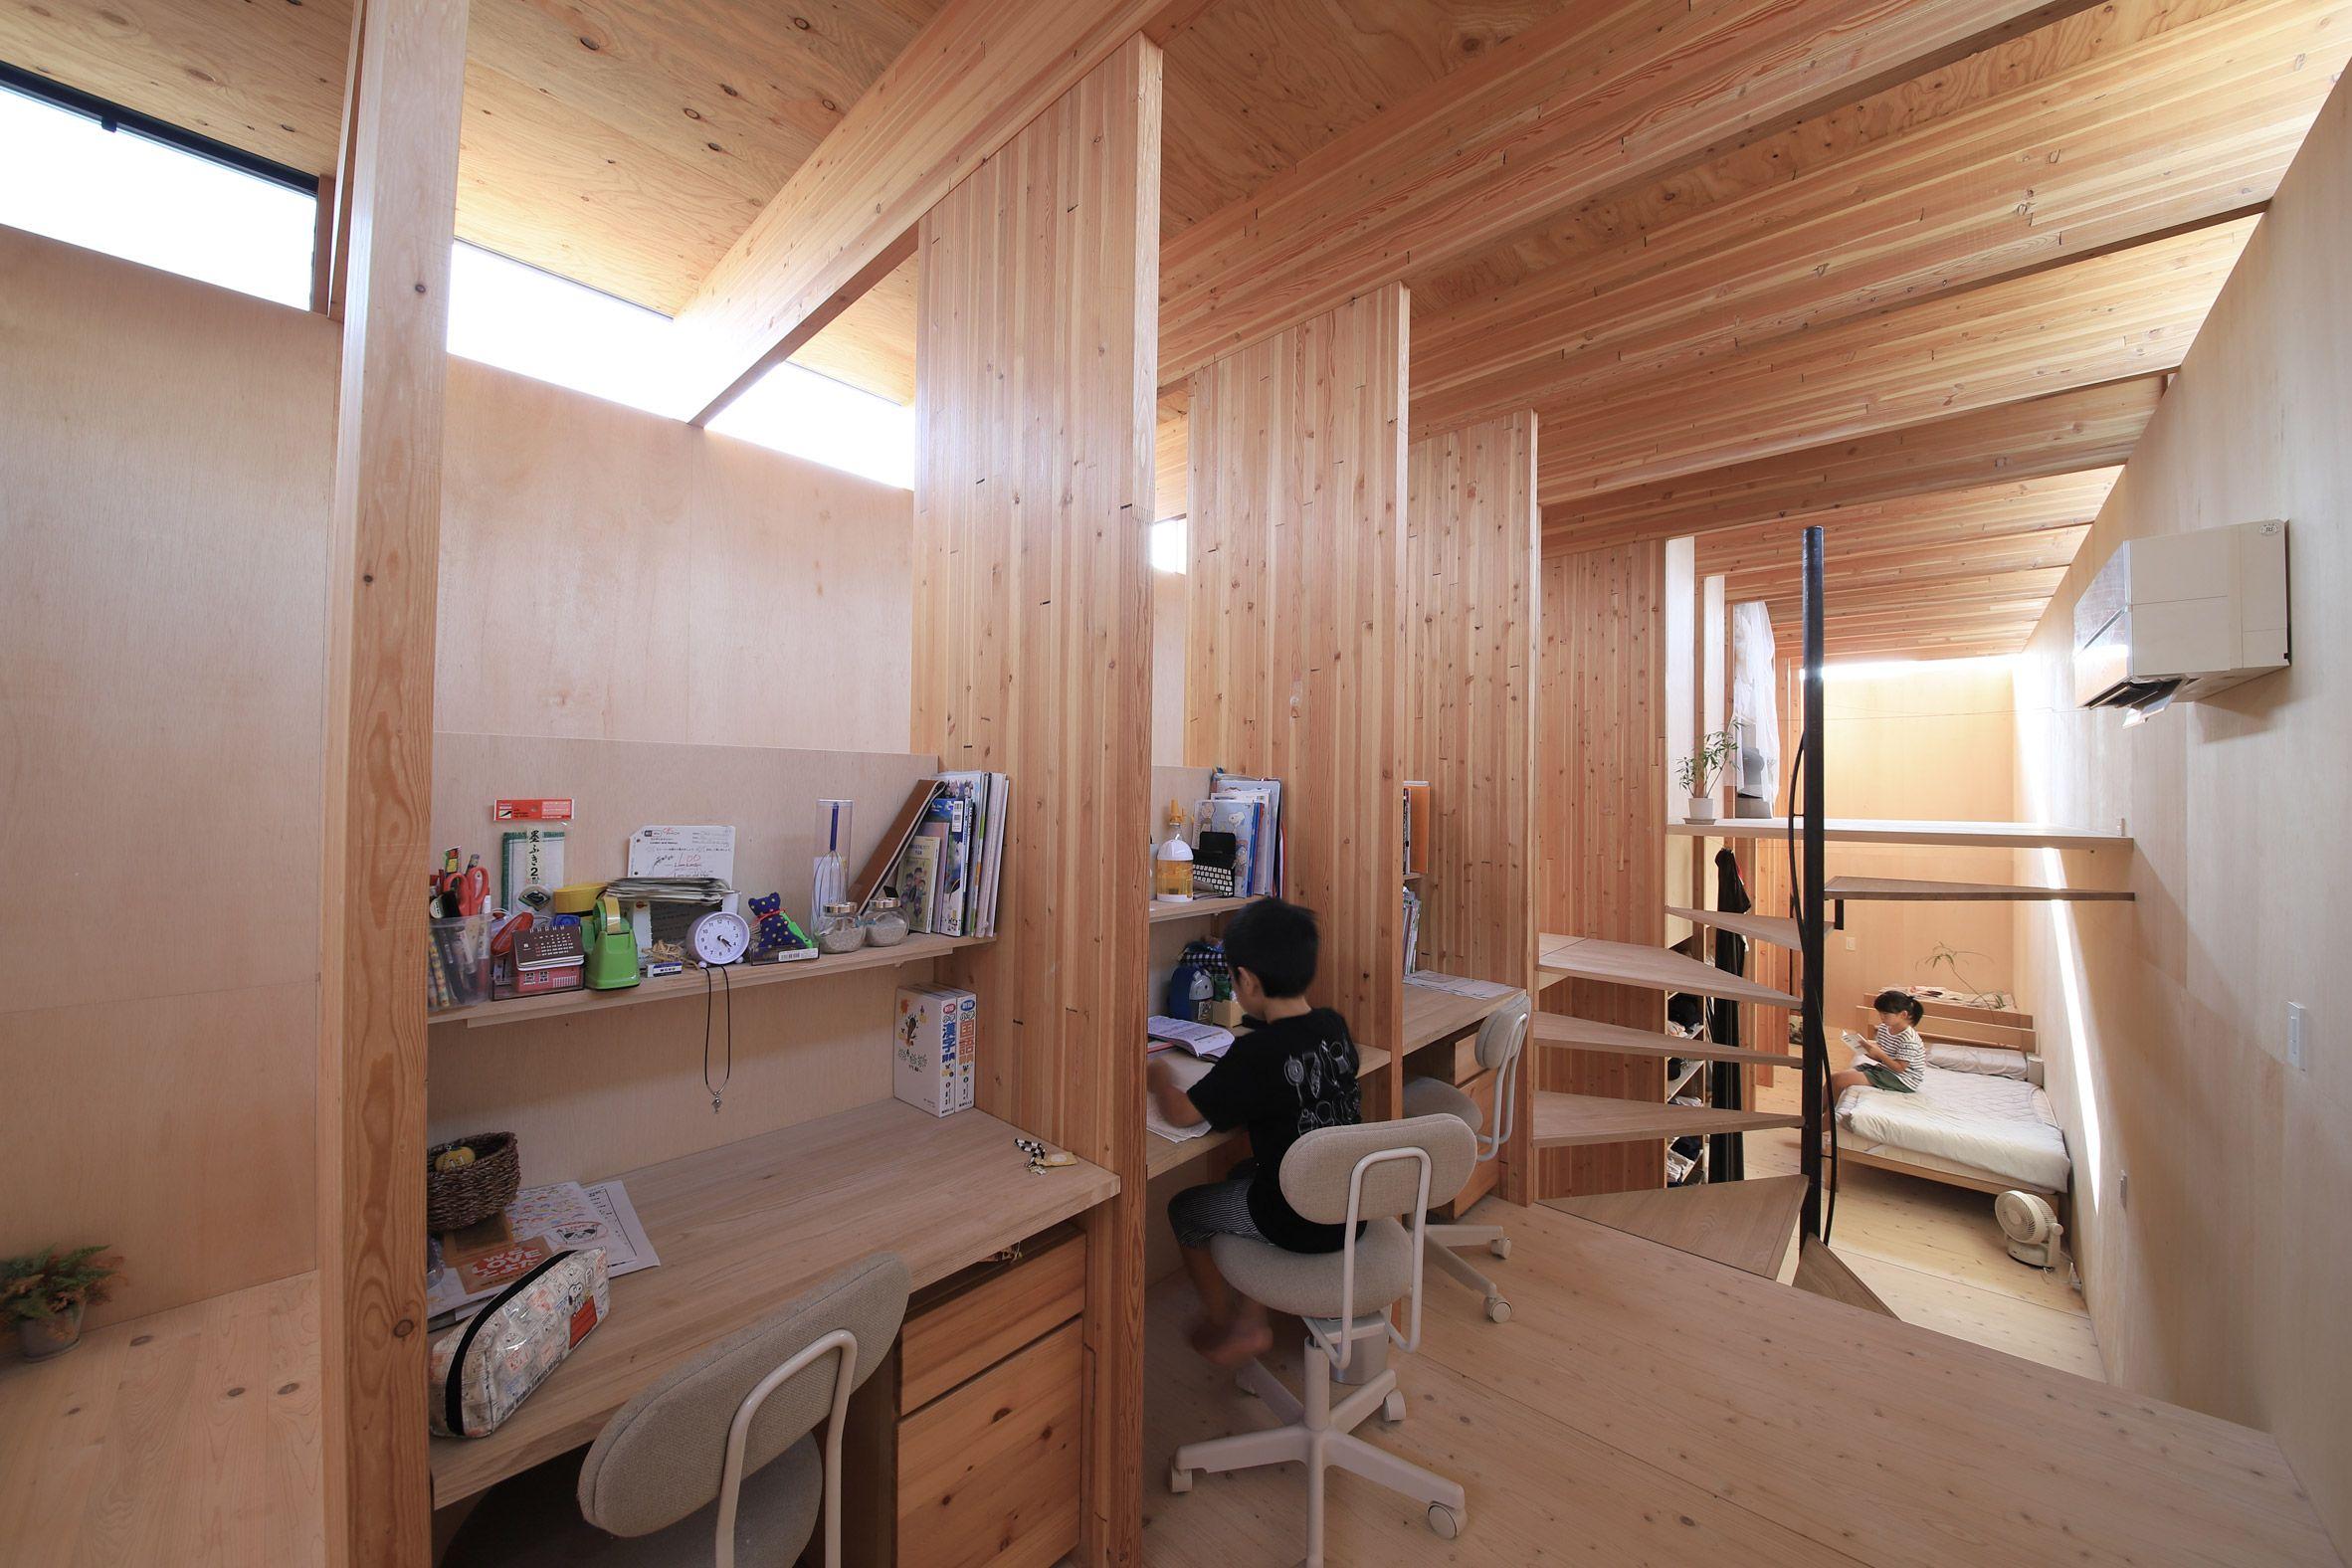 Katsutoshi sasakis minimalist home has a dark exterior and a light